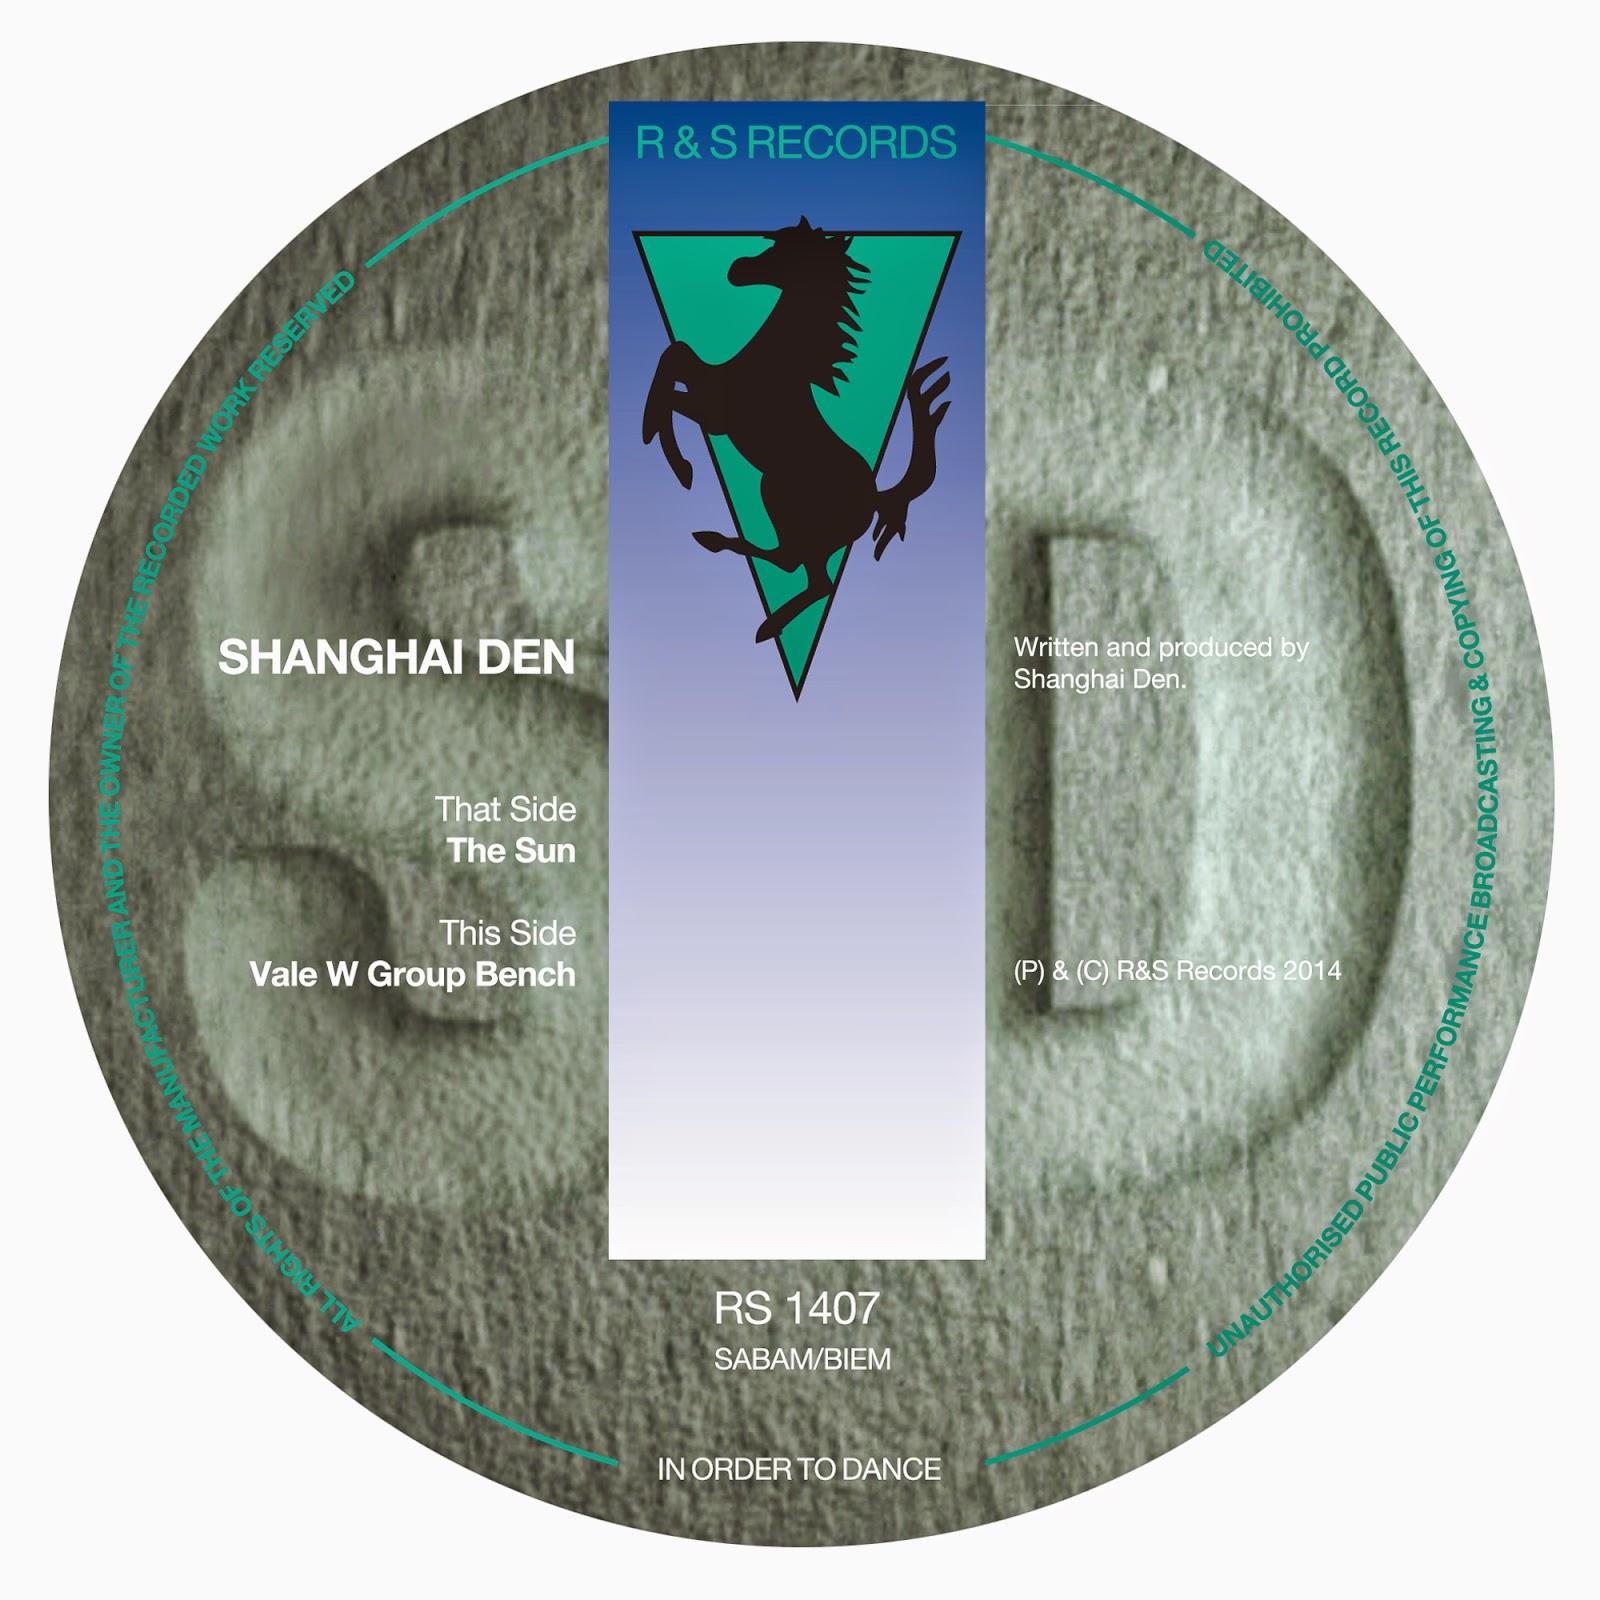 Discosafari - SHANGHAI DEN - The Sun / Vale W Group - R & S Records